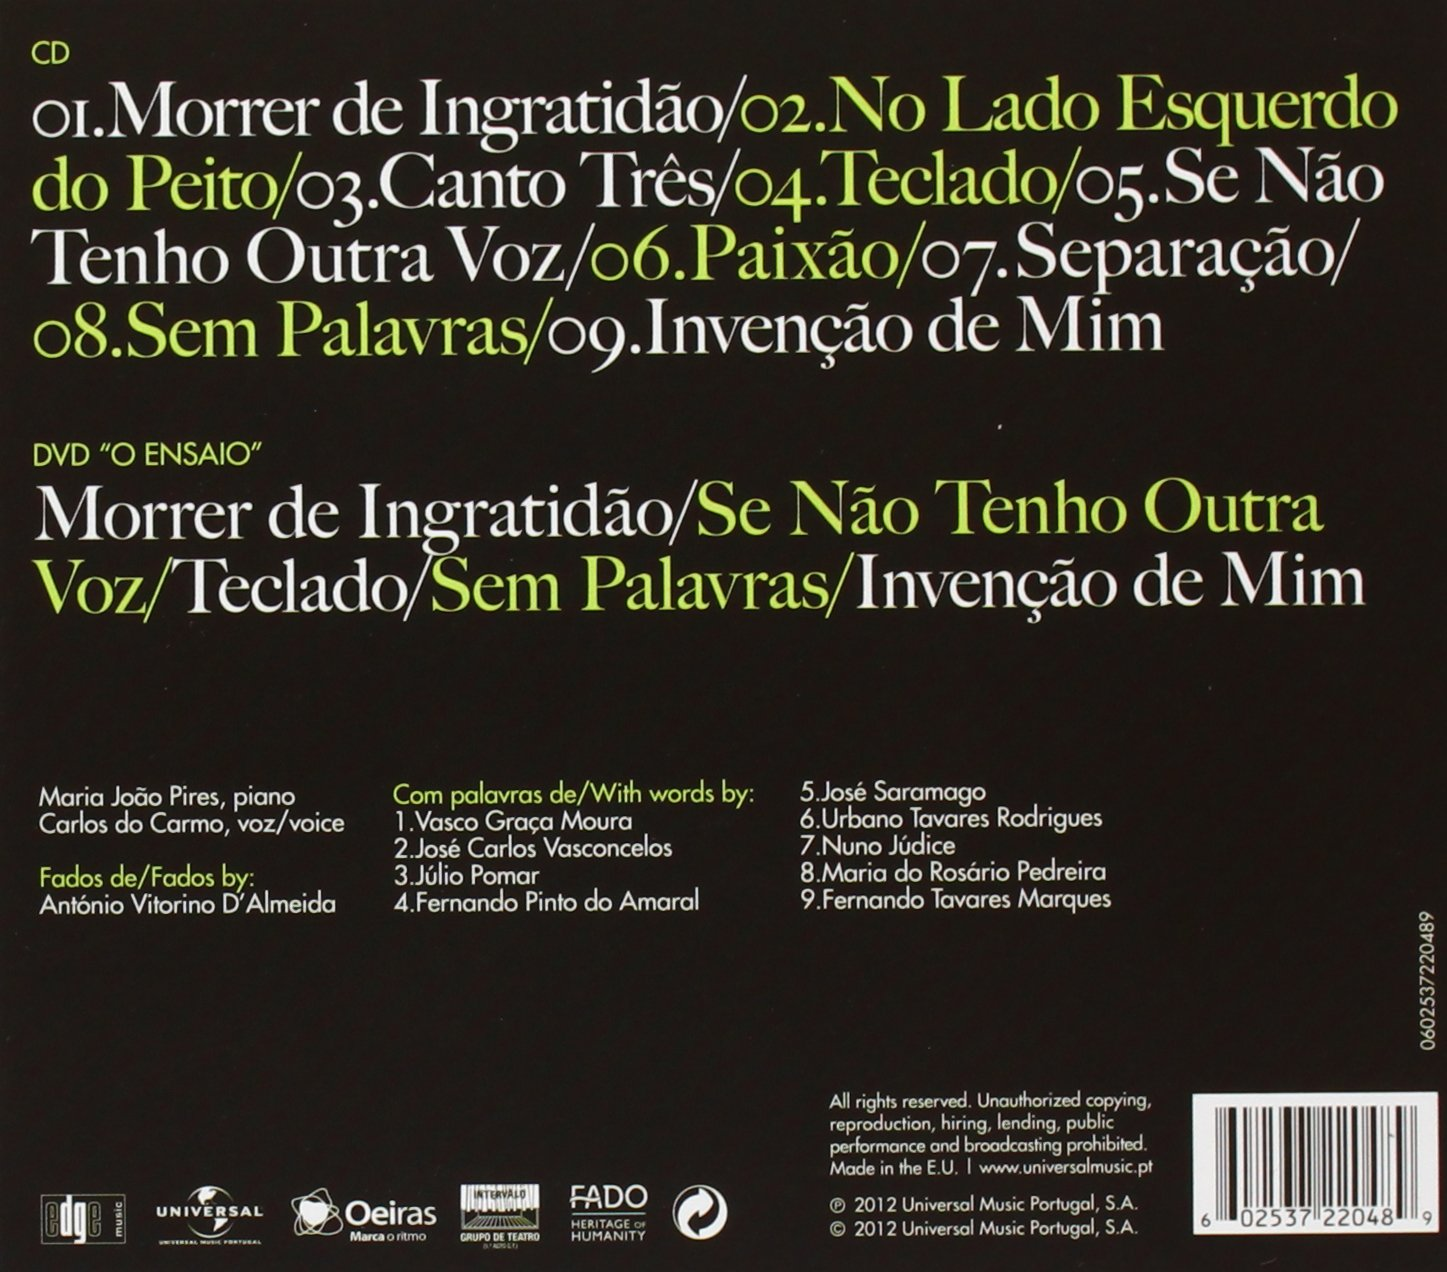 Carlos Do Carmo, Carlos Do & Maria Joao Pires Do Carmo - Carlos Do Carmo & Maria Joao Pires - Amazon.com Music